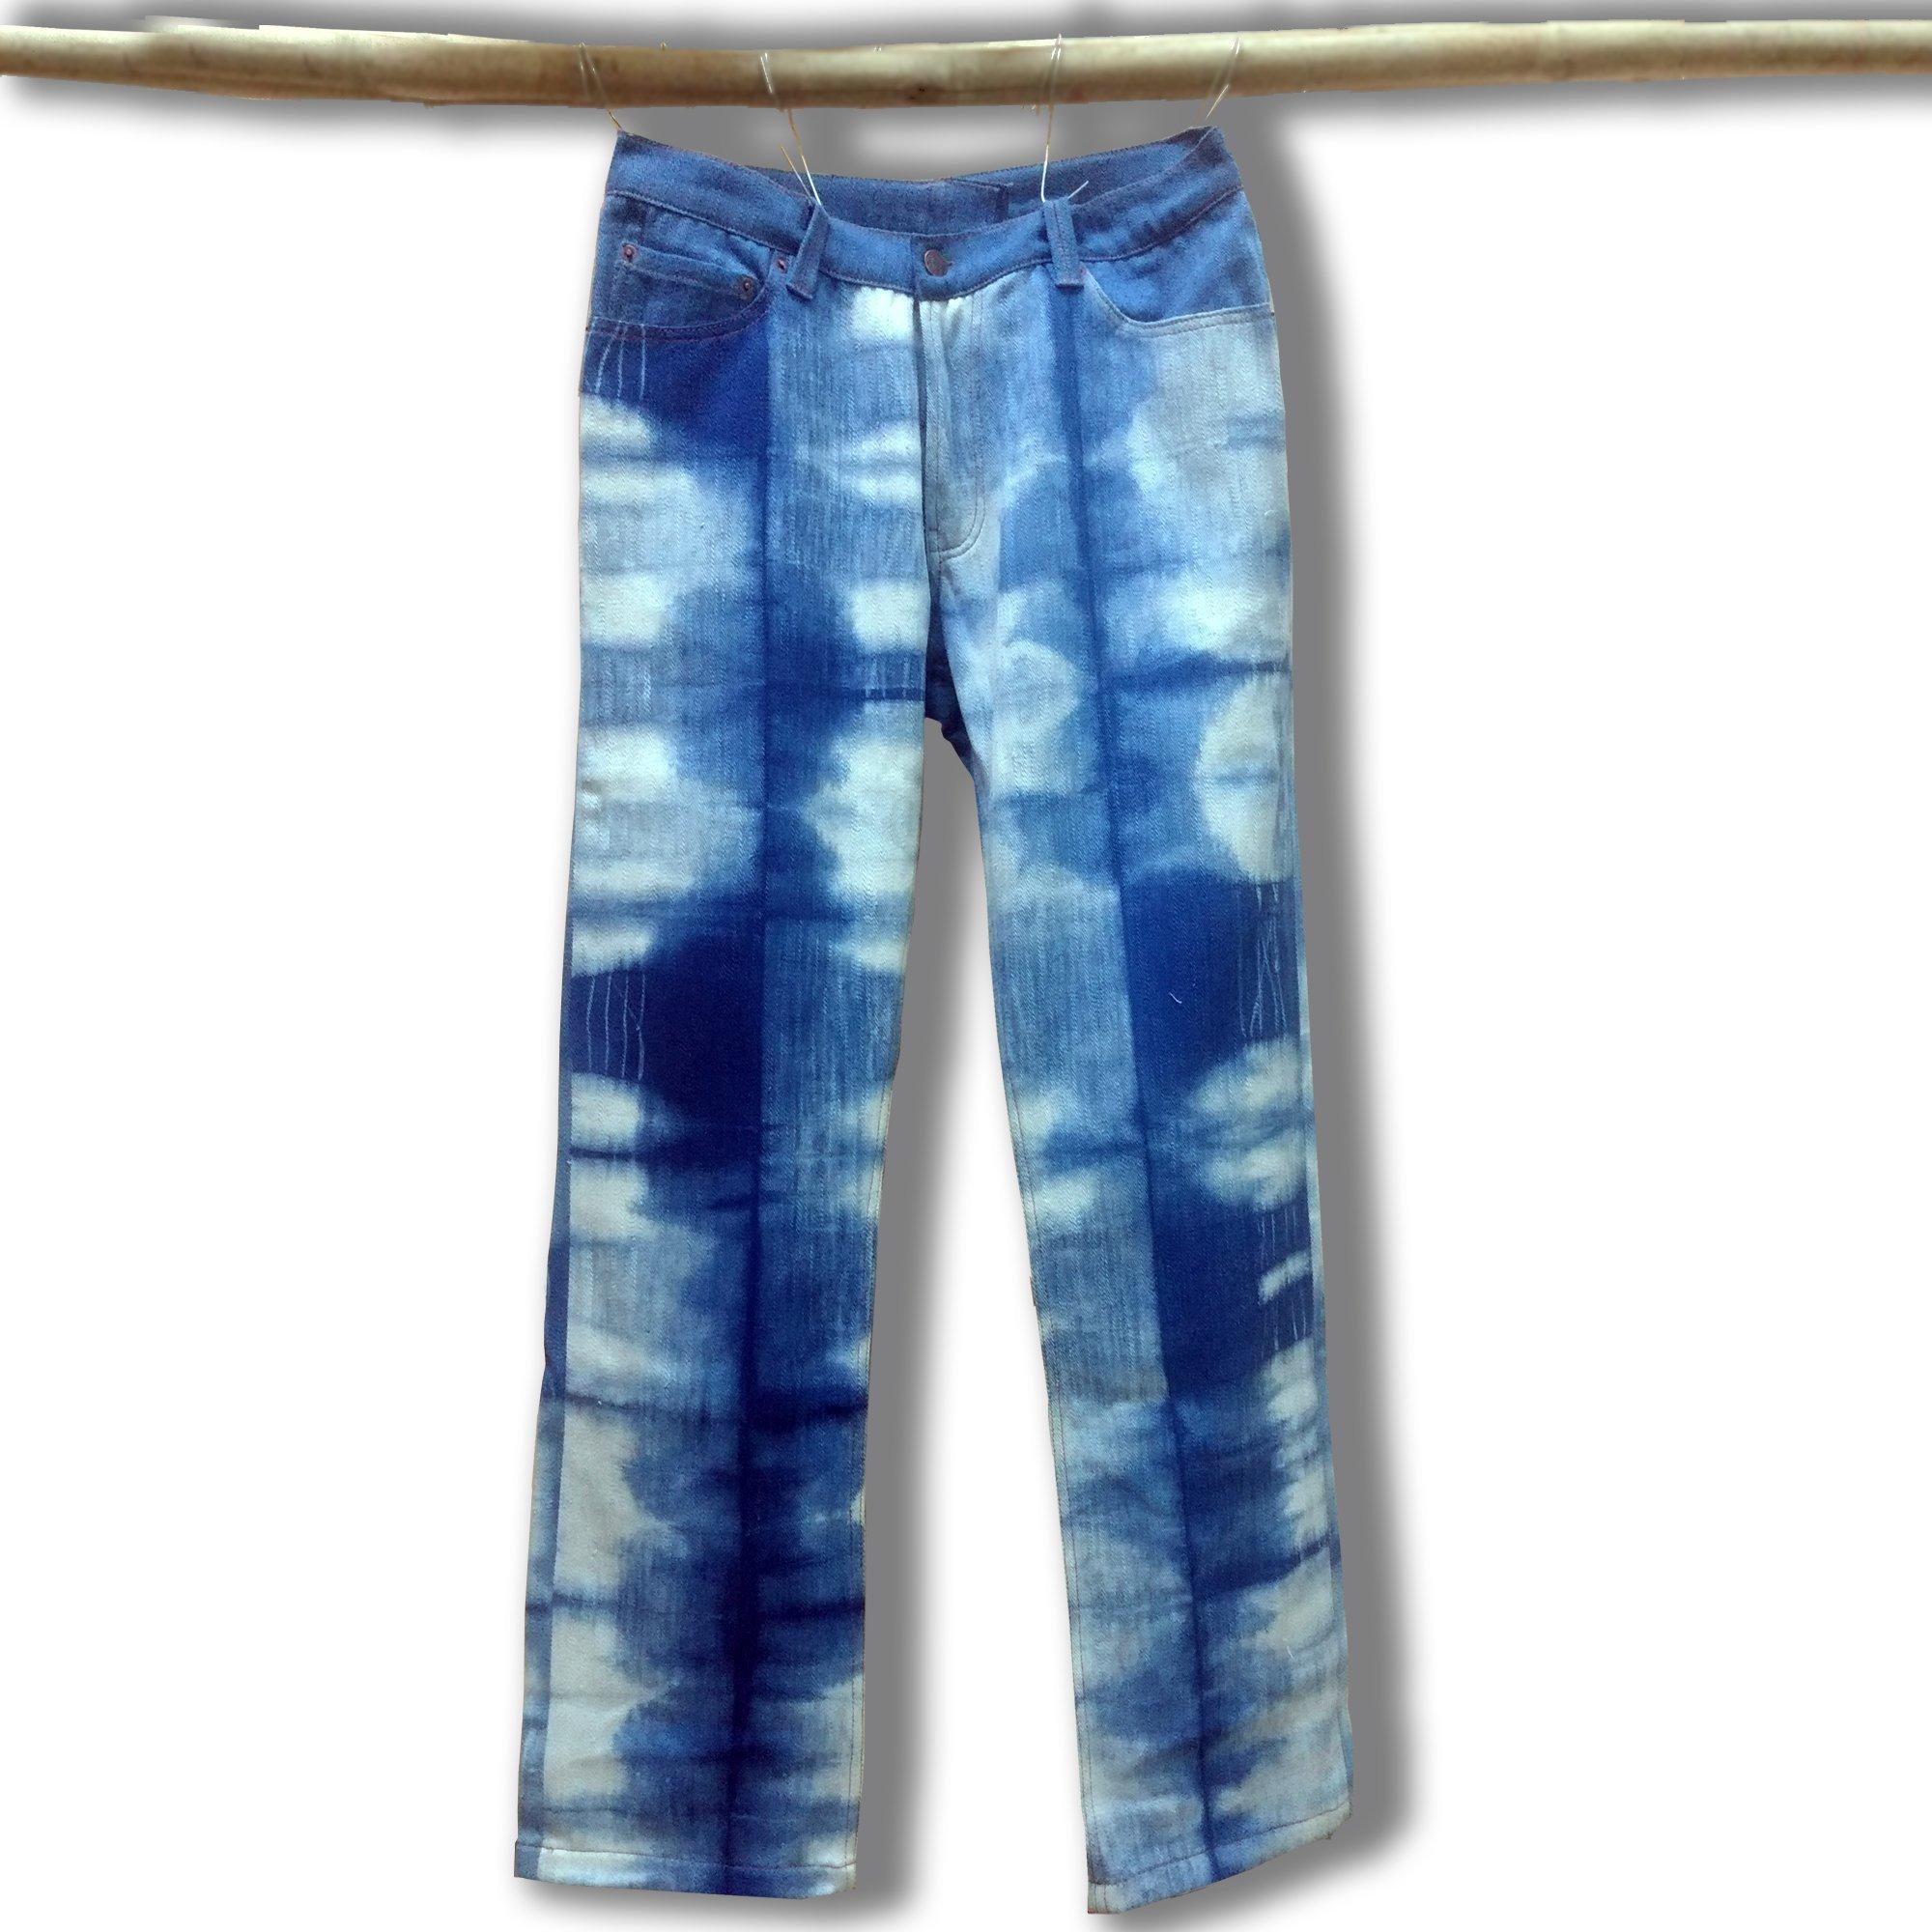 Denim Club India Hand-crafted Khadi Denim Jeans - Tie & Dye